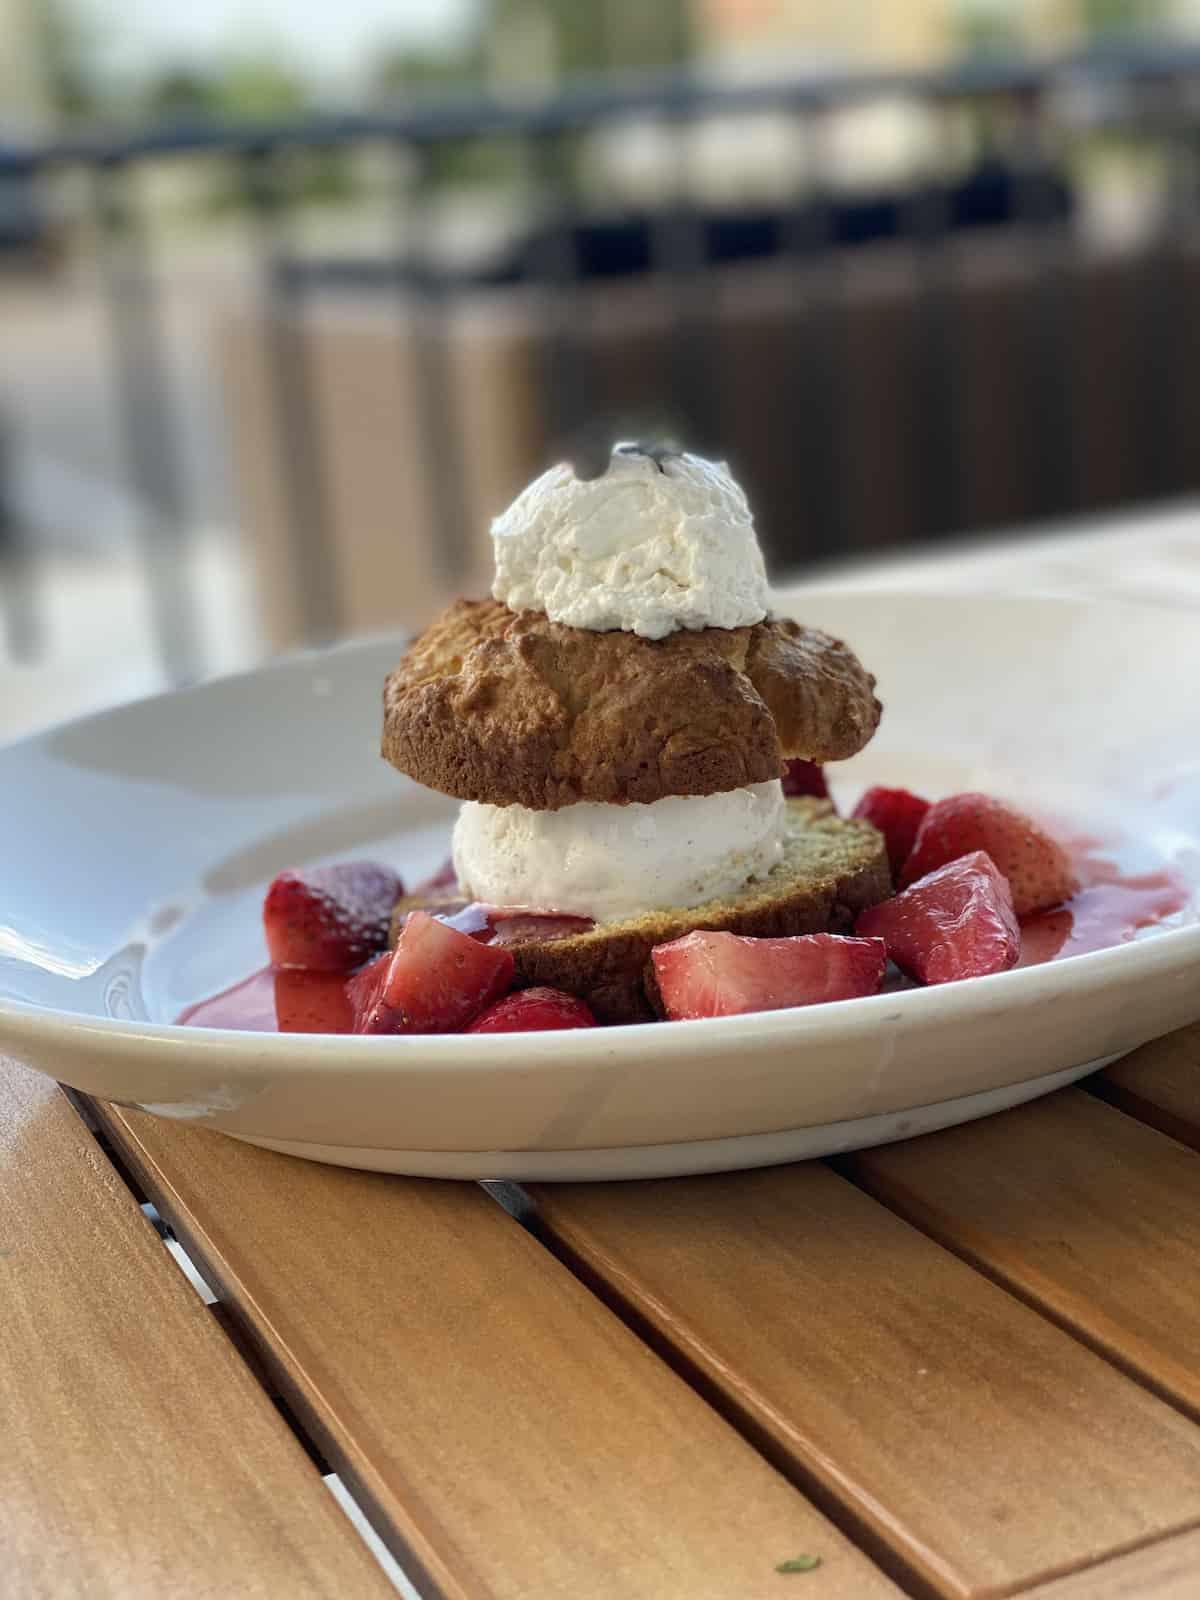 Strawberry shortcake with shipped cream.